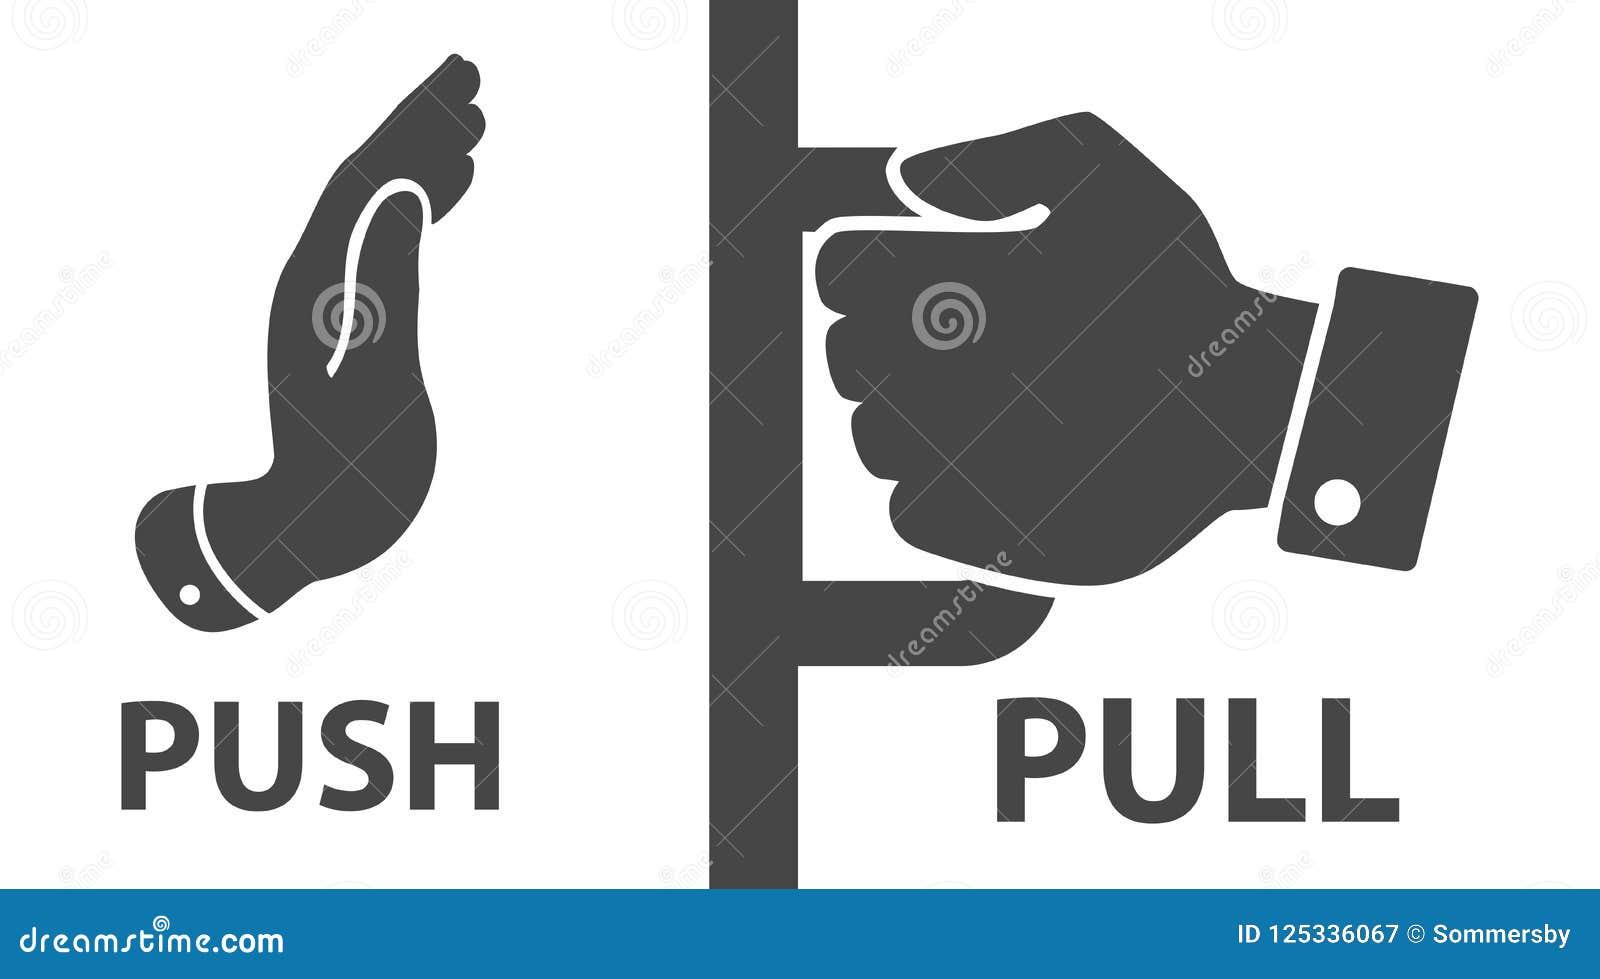 Push pull icon stock illustrations 322 push pull icon stock illustrations vectors clipart dreamstime